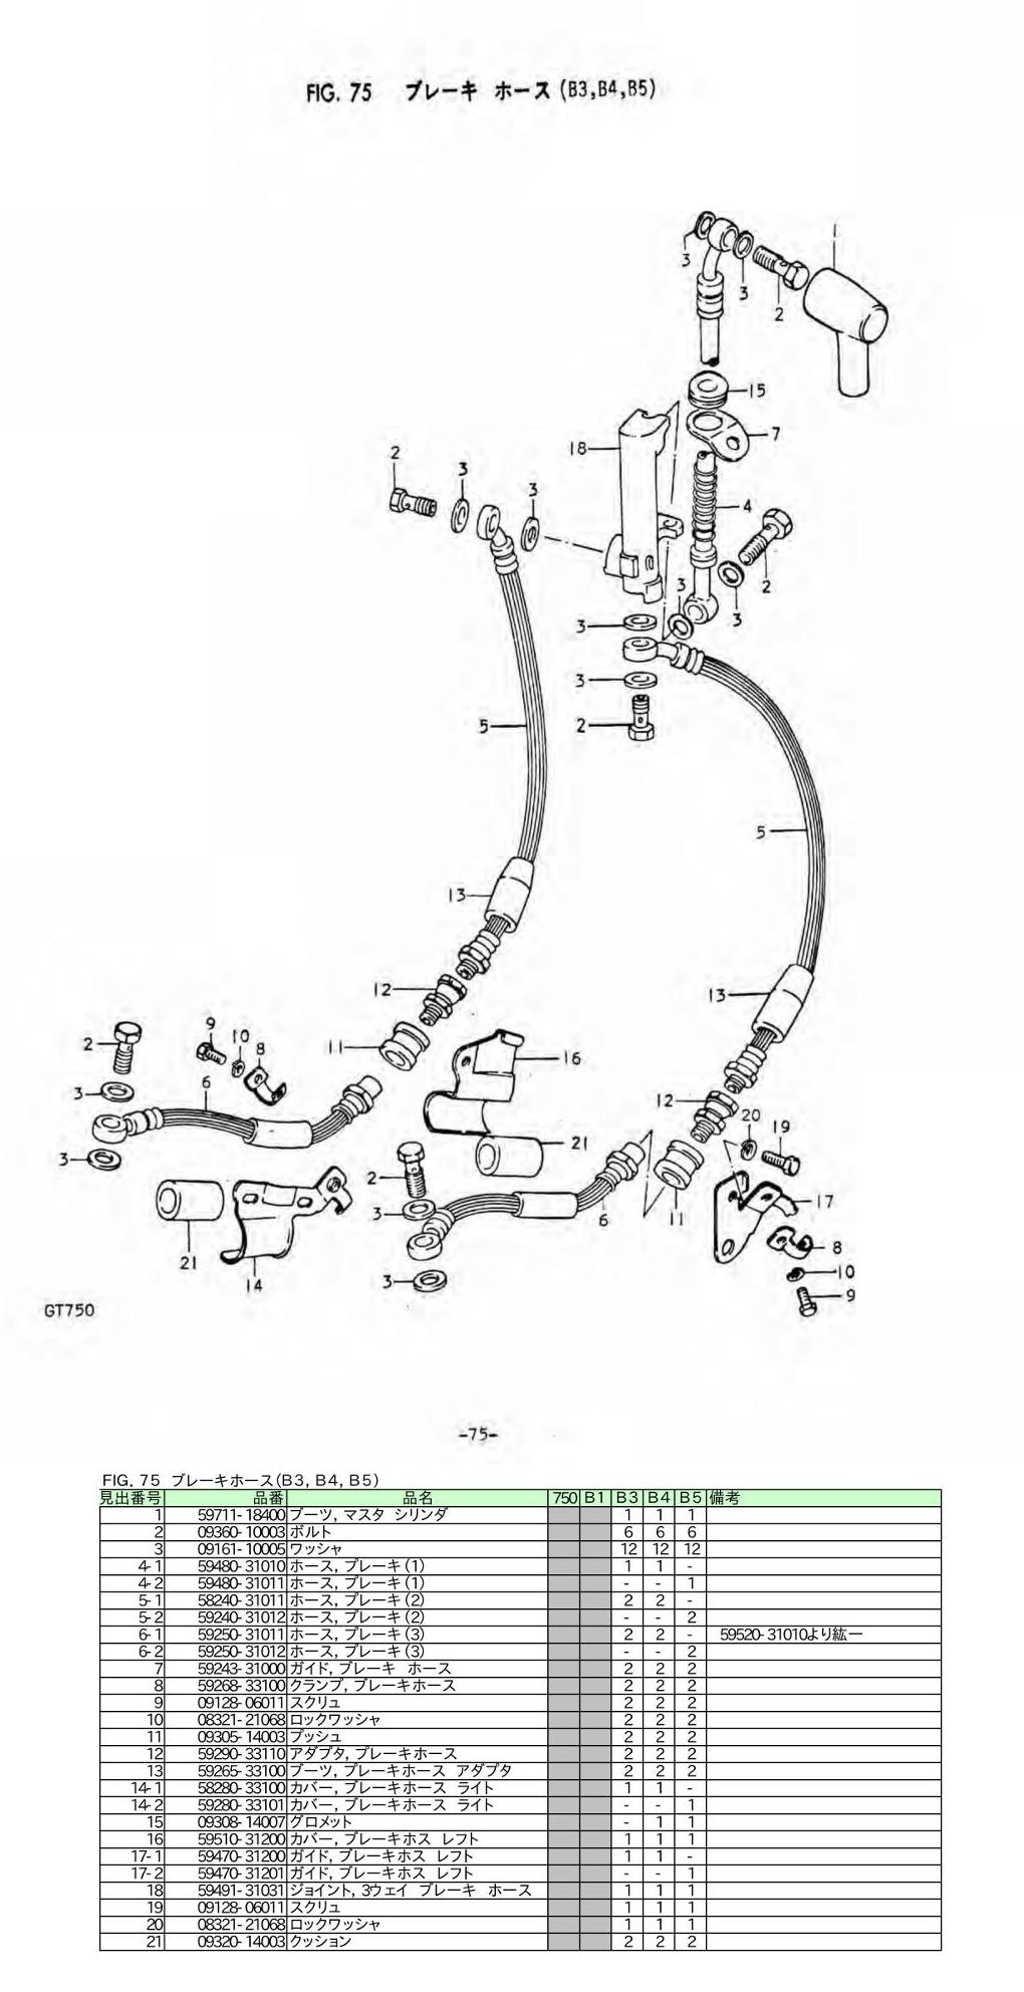 gt750 japan market parts manual